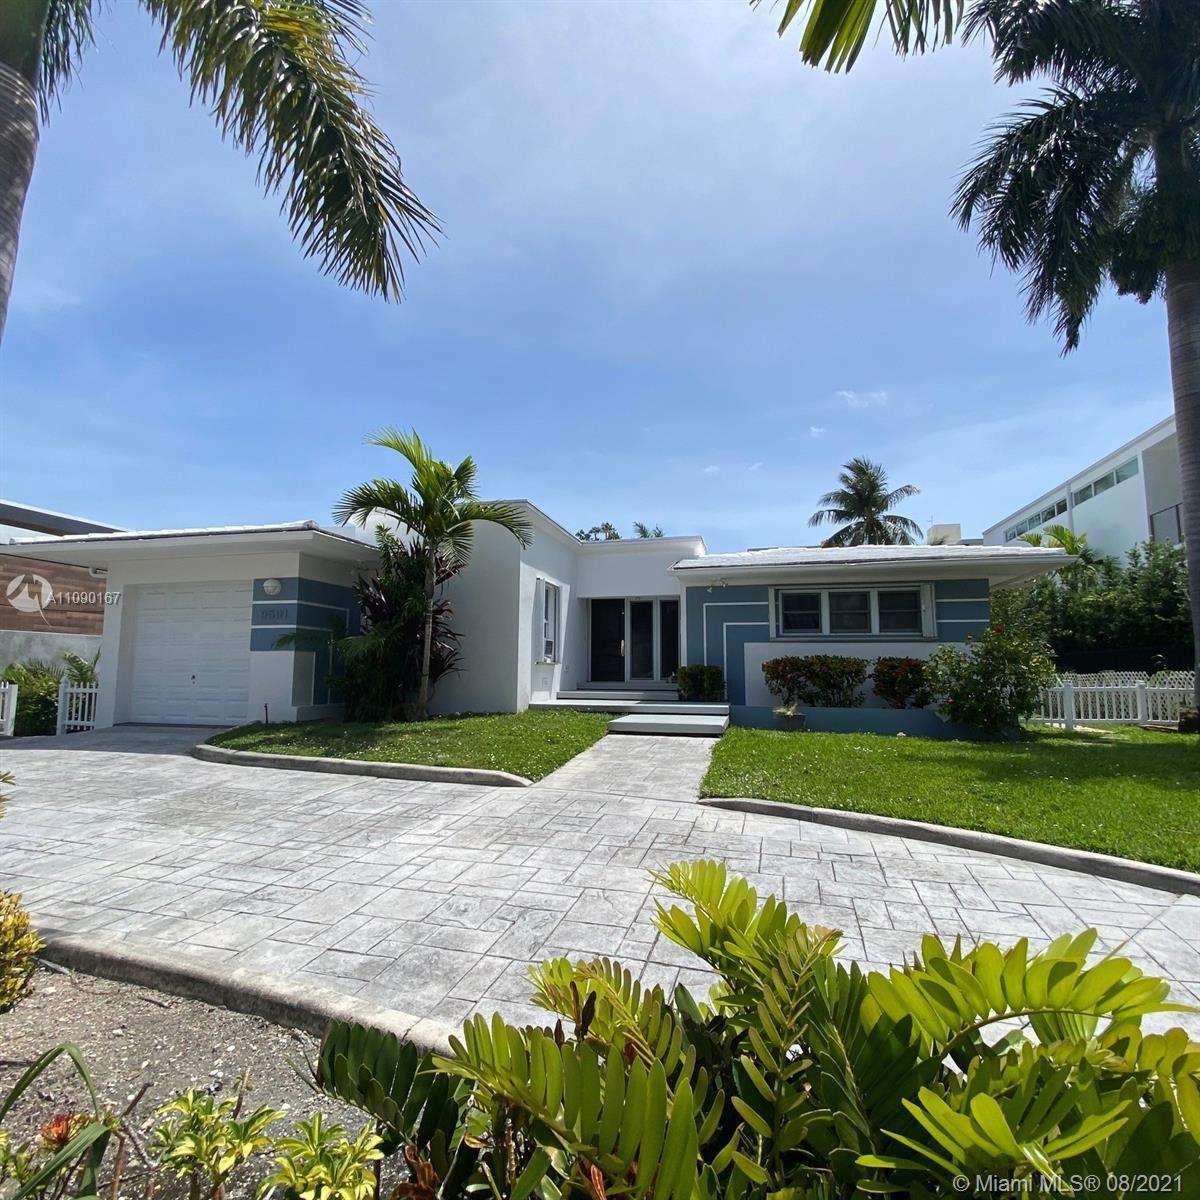 9501 E Broadview Dr, Bay Harbor Islands, FL 33154 - #: A11090167